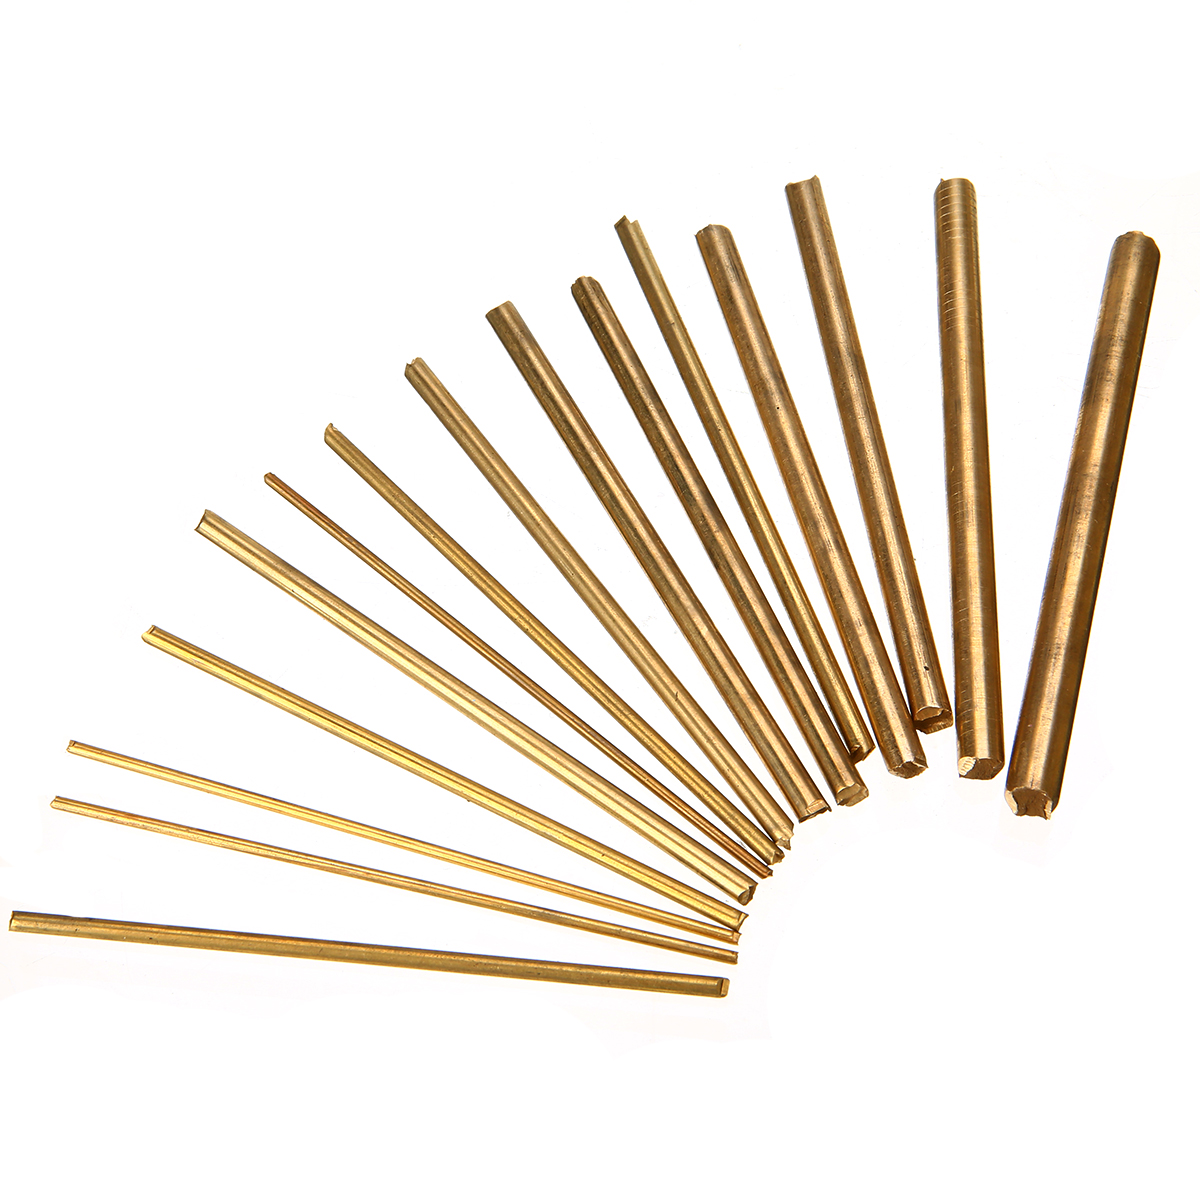 все цены на 15pcs Copper Brass Round Rods Shafts Bar Watchmaker Lathe Watch Tool Craft Parts Mayitr For DIY Craft Making 100mm Length